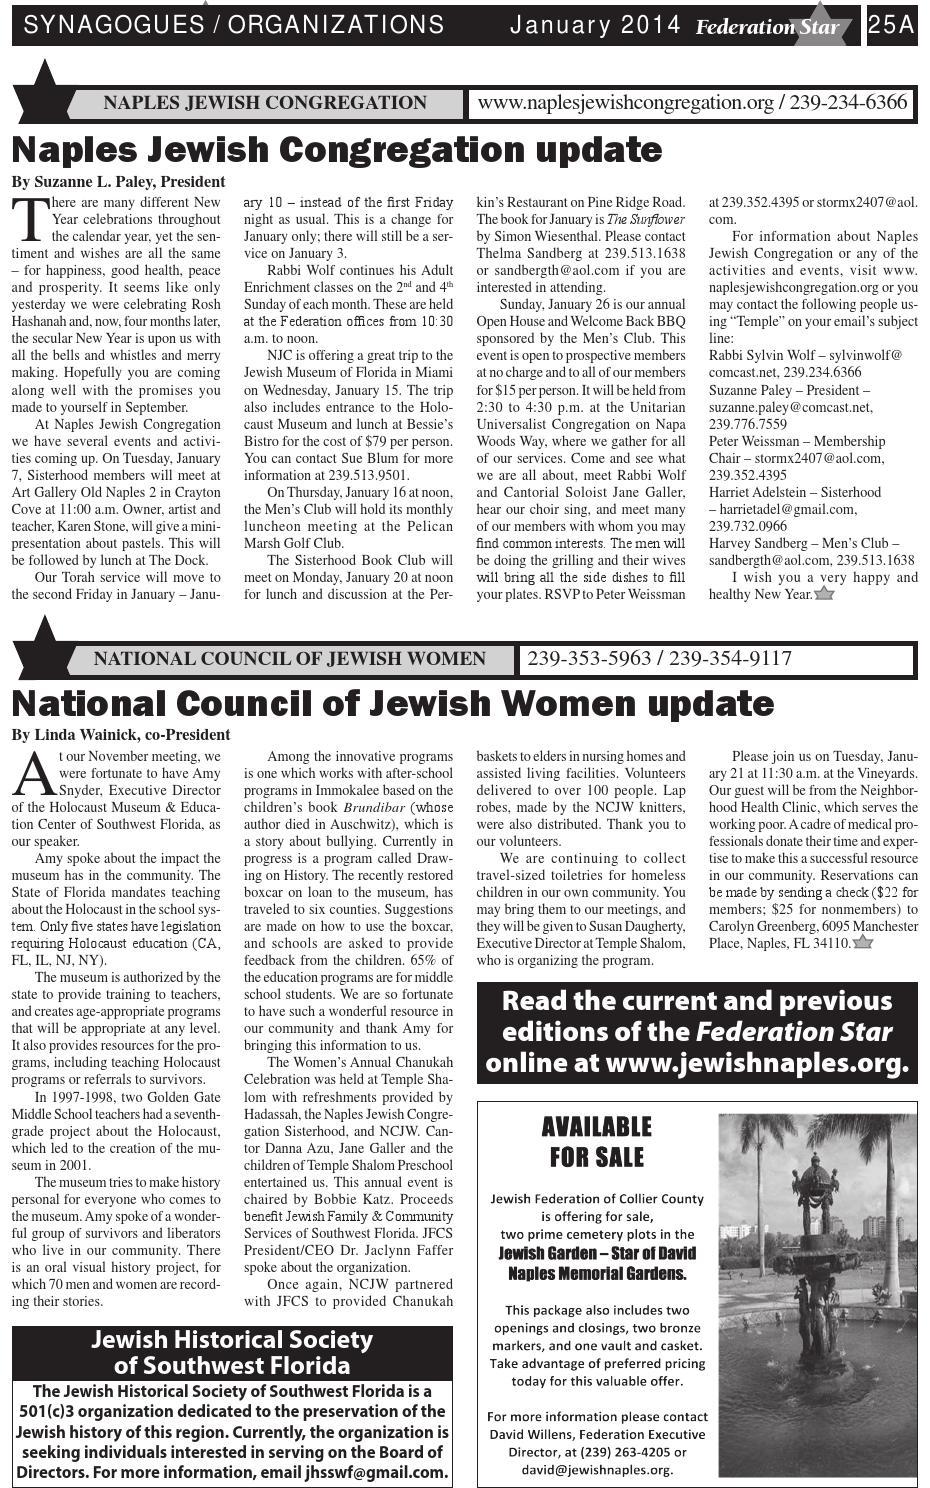 Federation Star - January 2014 by Jewish Federation of